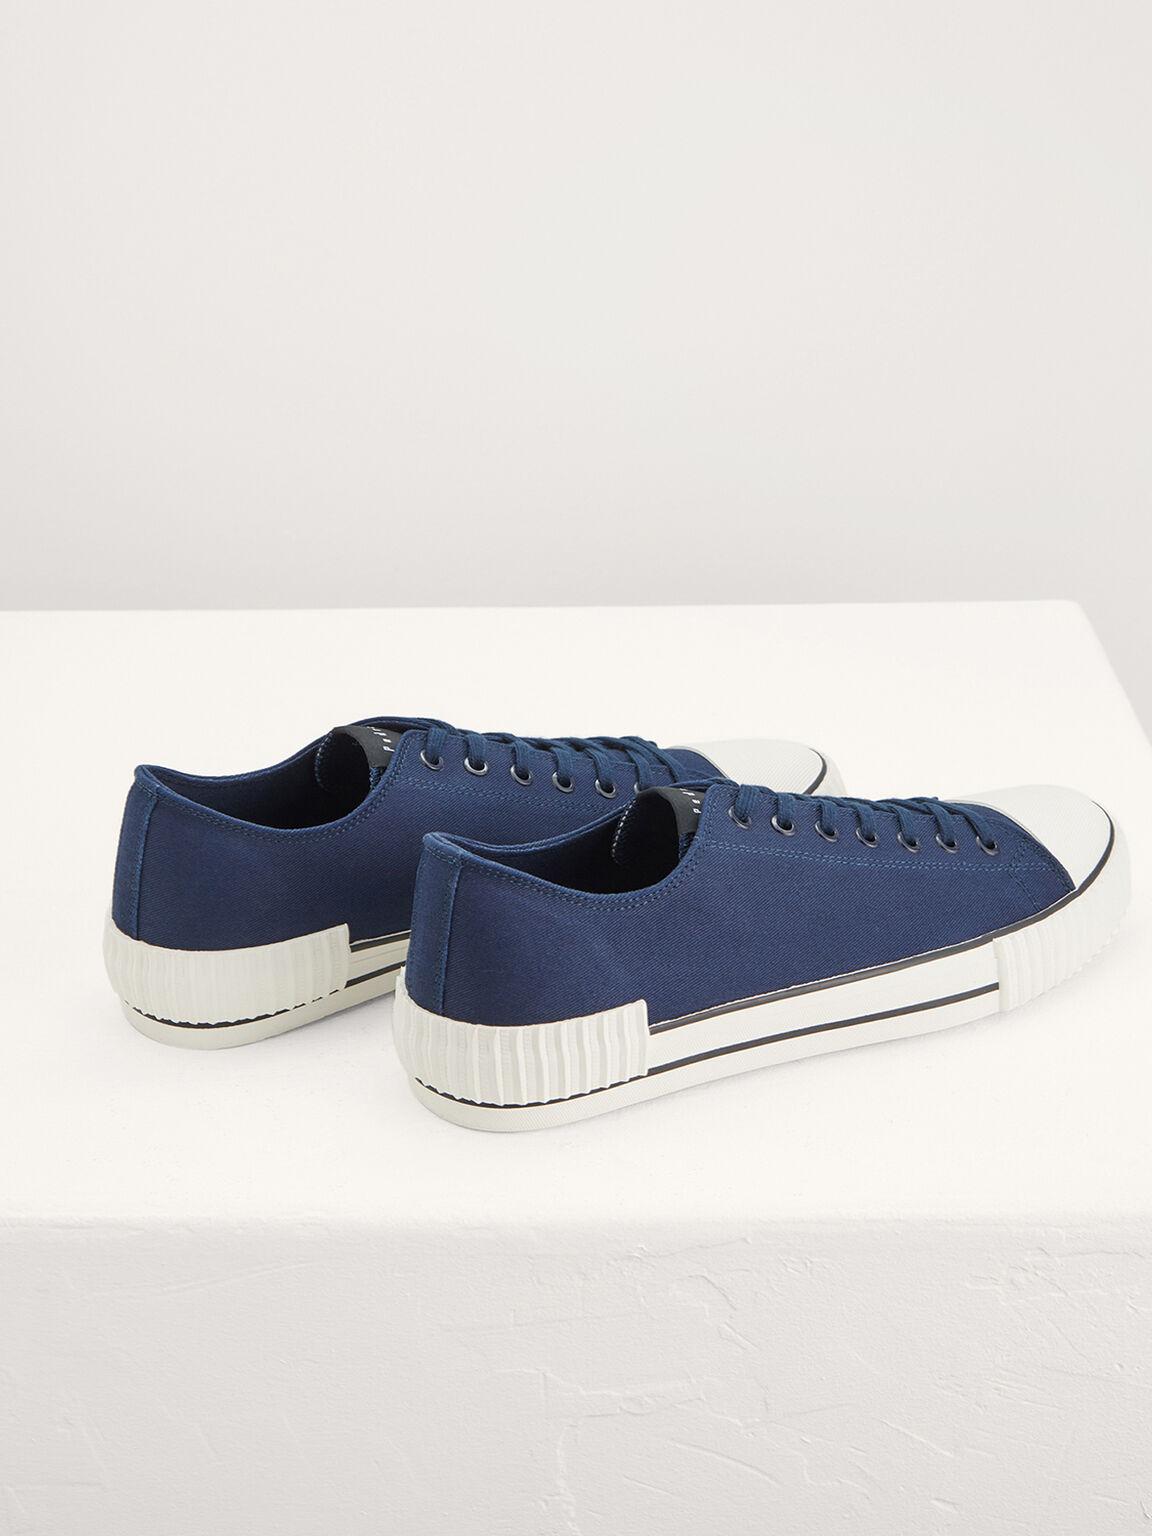 Casual Canvas Sneakers, Navy, hi-res